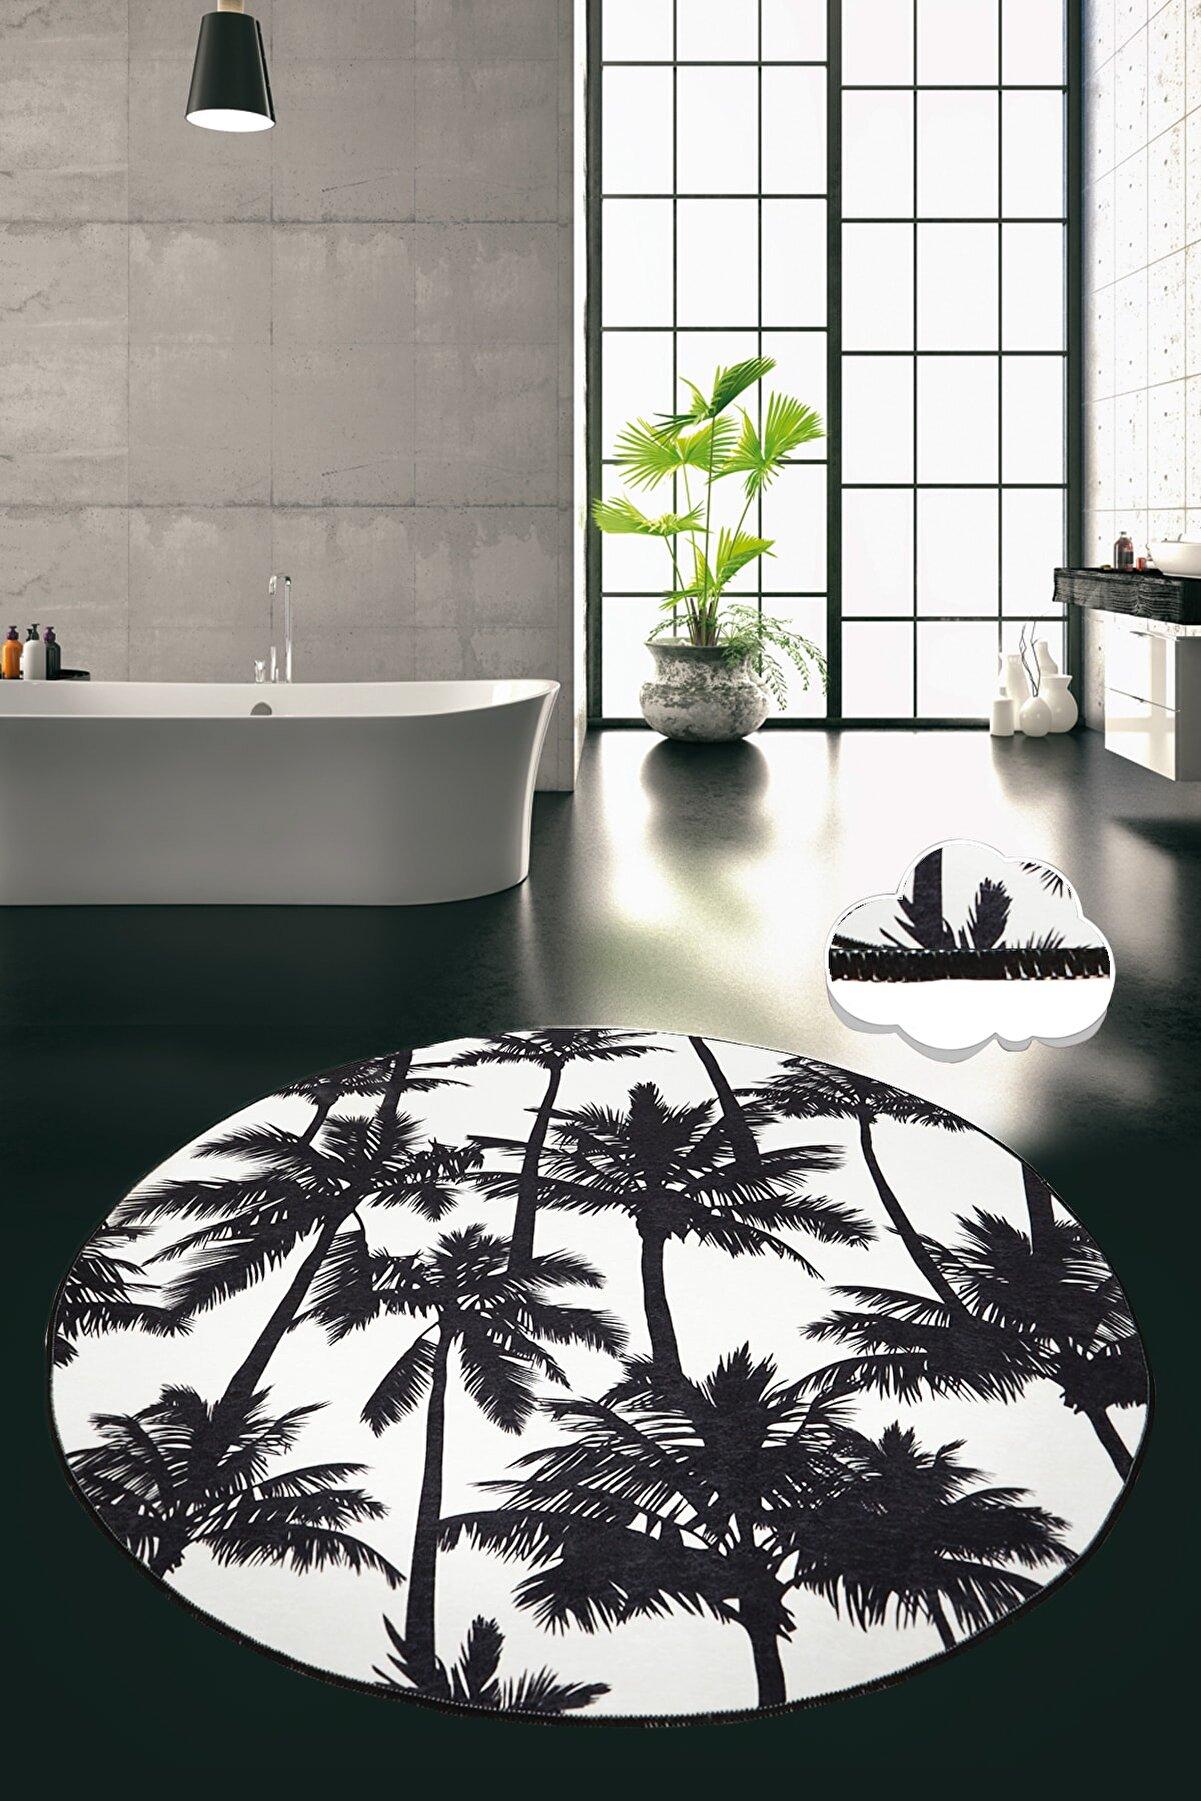 Chilai Home PALM DJT ÇAP 100 cm Banyo Halısı